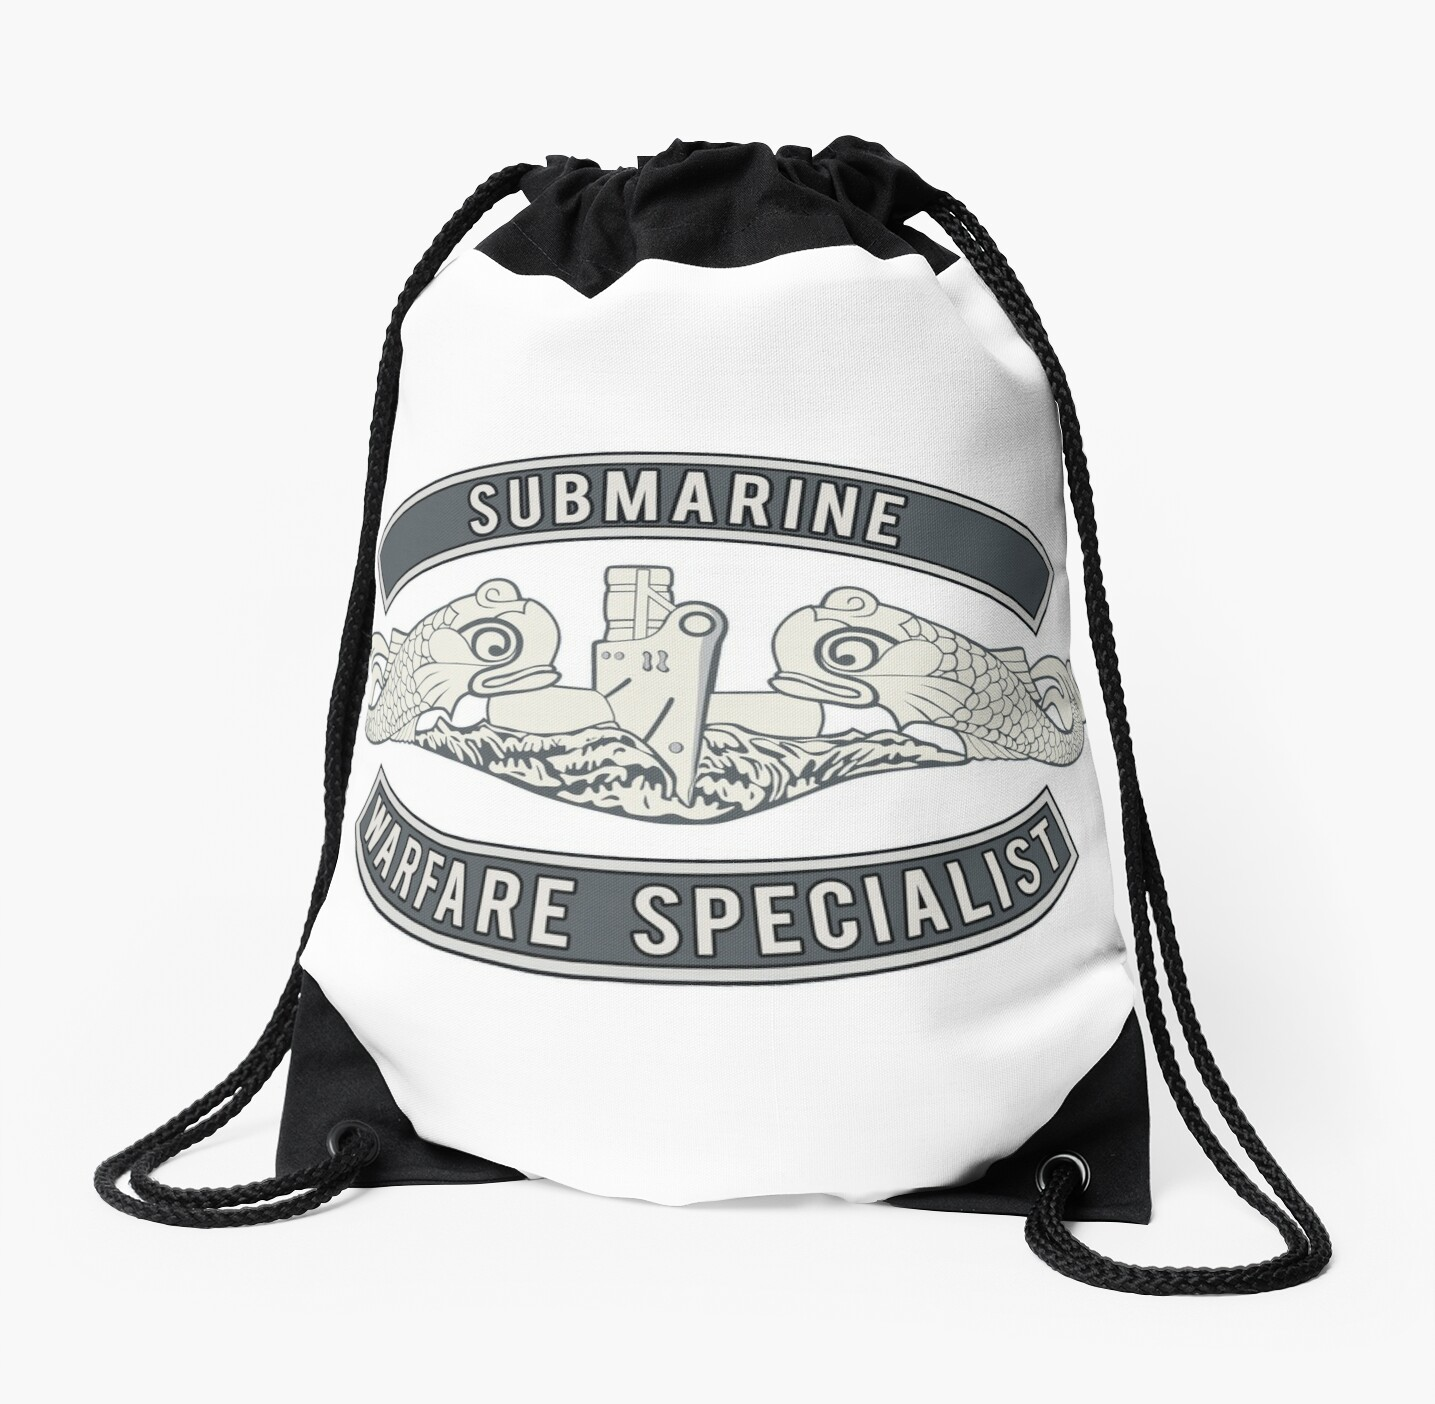 Submarine Warfare Specialist by jcmeyer